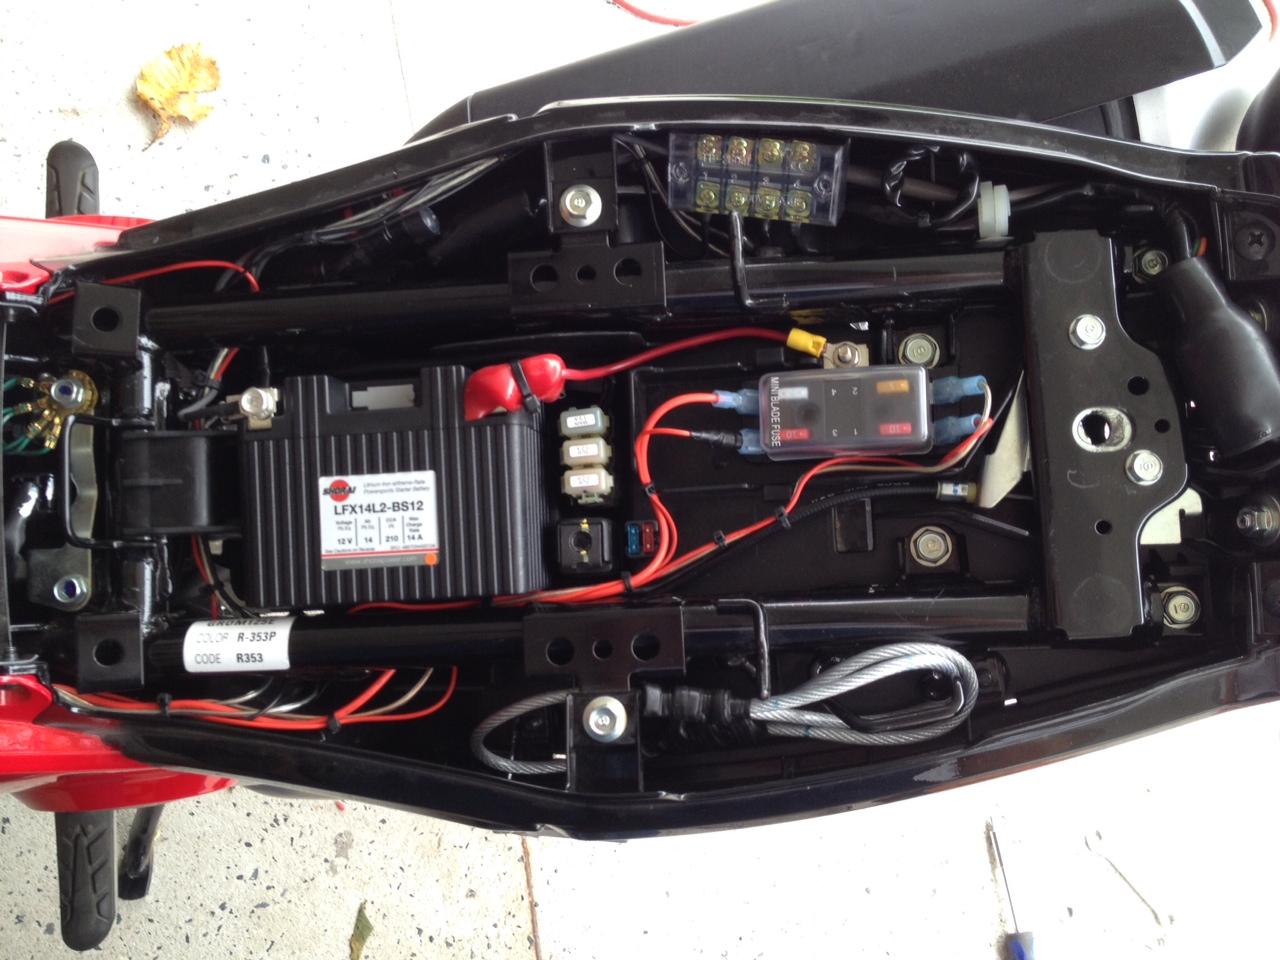 Dual Sport Wiring Electrical Diagram Tusk Kit Build Lantz S Hypermoto Rh Hondagrom Net